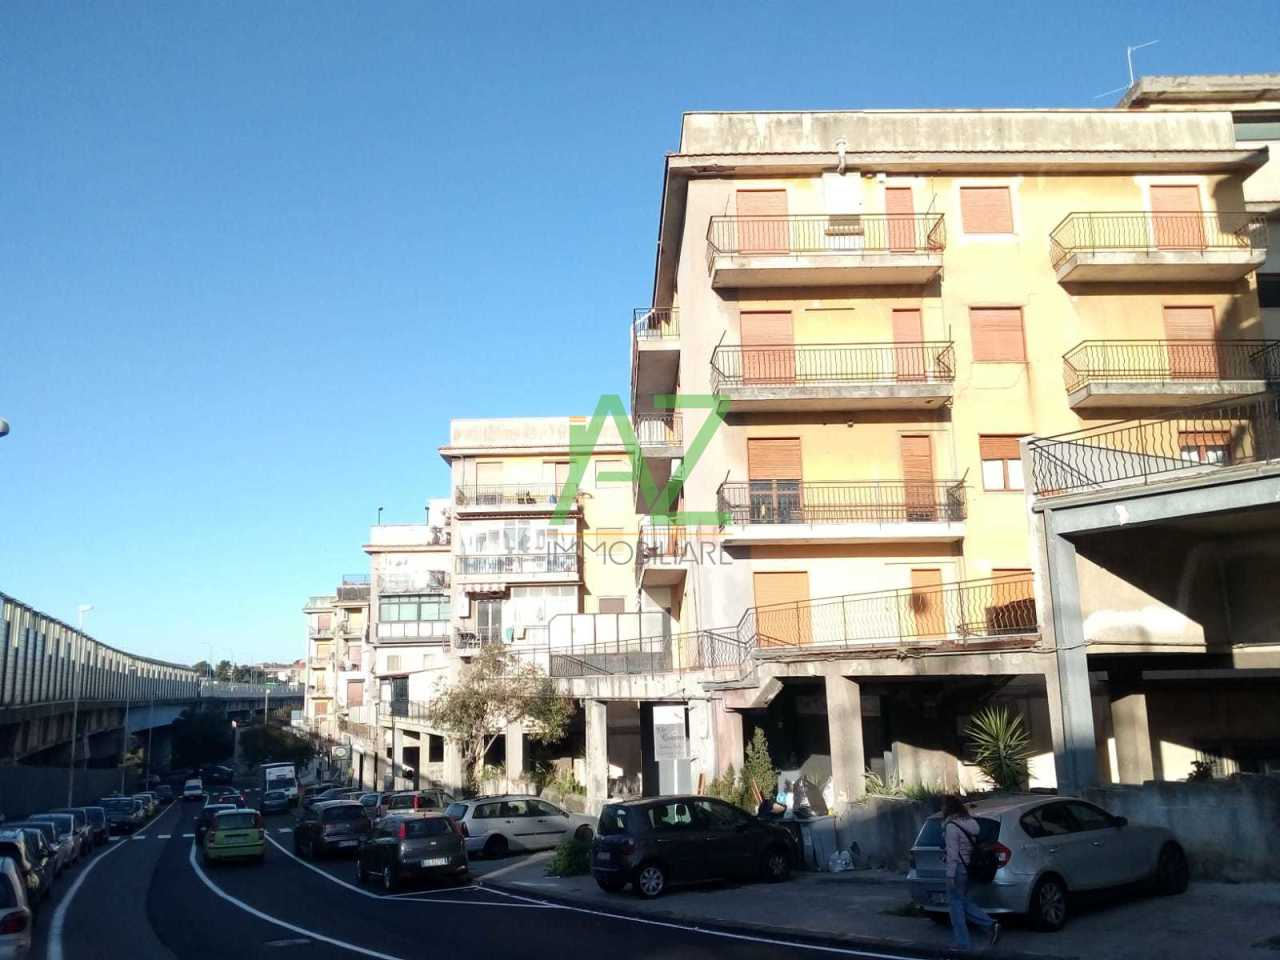 Appartamento - con Garage a San Paolo, Gravina di Catania